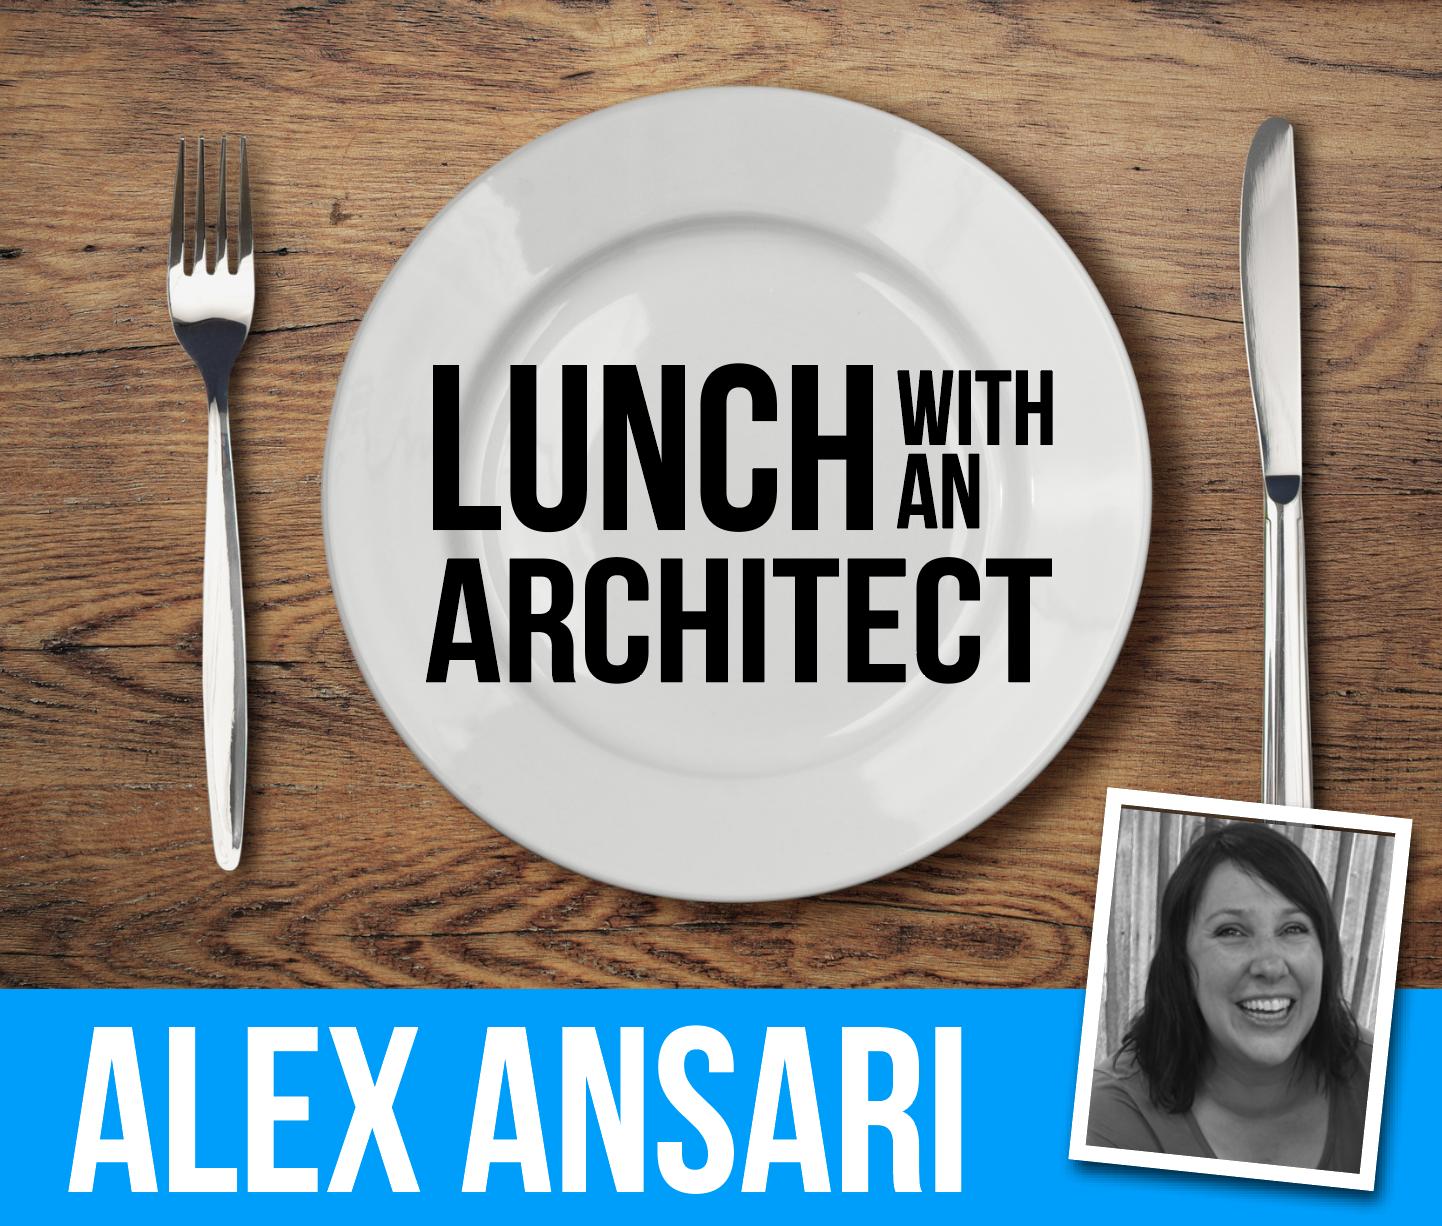 Last-minute Cheese Sandwiches and Duran Duran with Alex Ansari